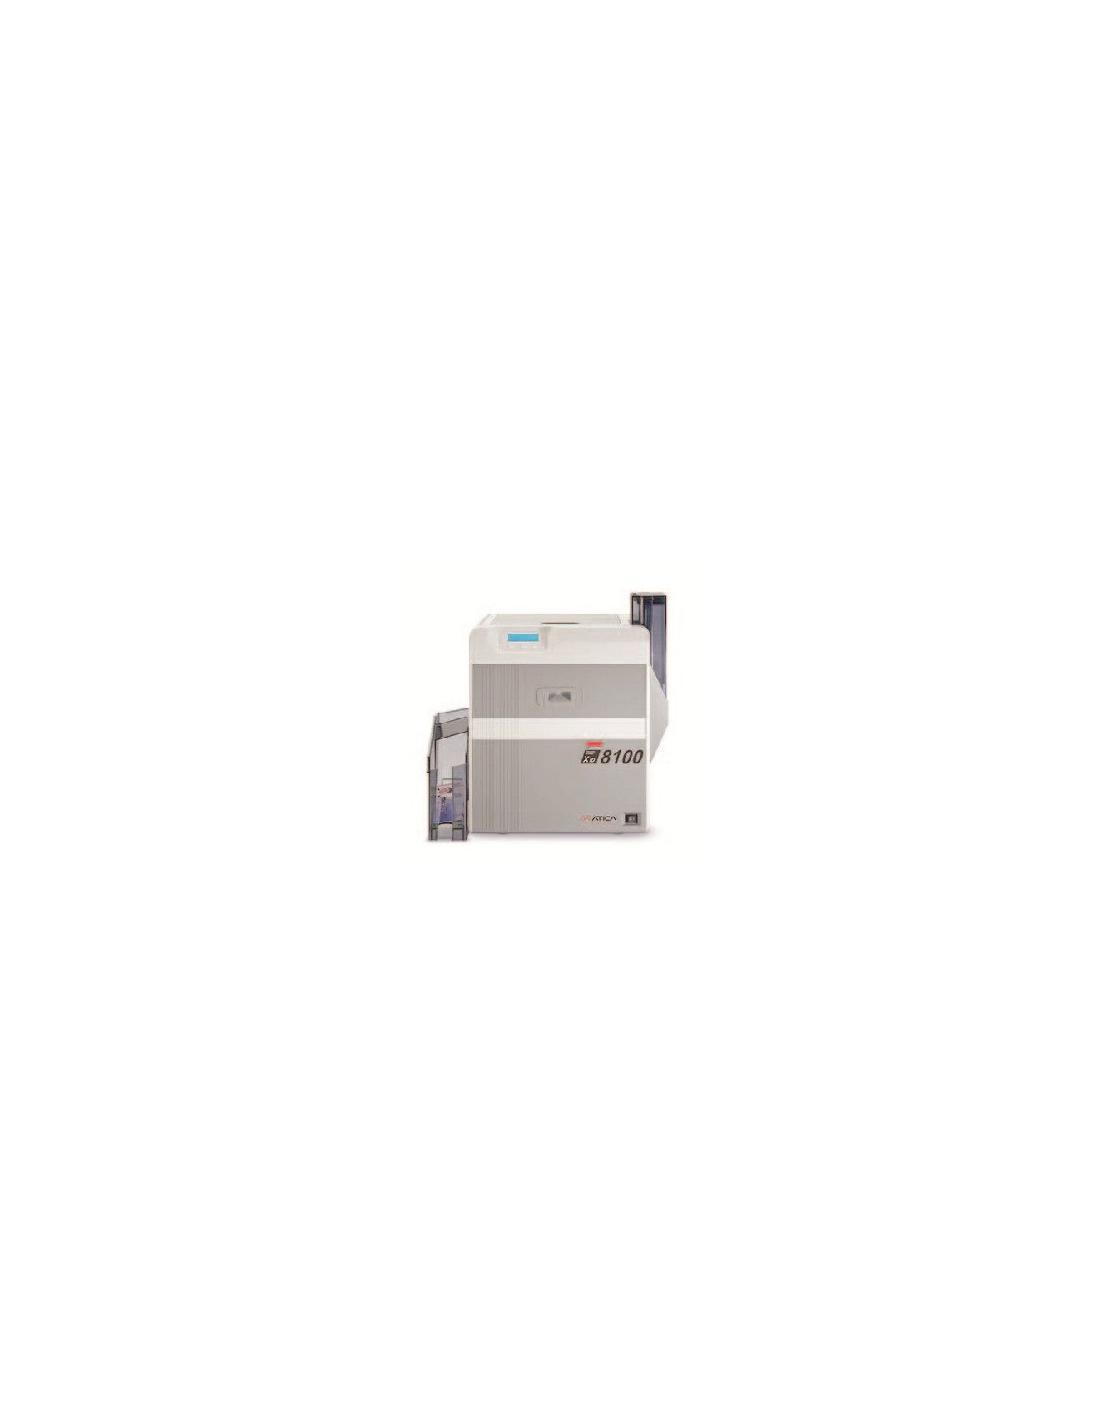 IMPRIMANTE MATICA XID 8100 SIMPLE FACE